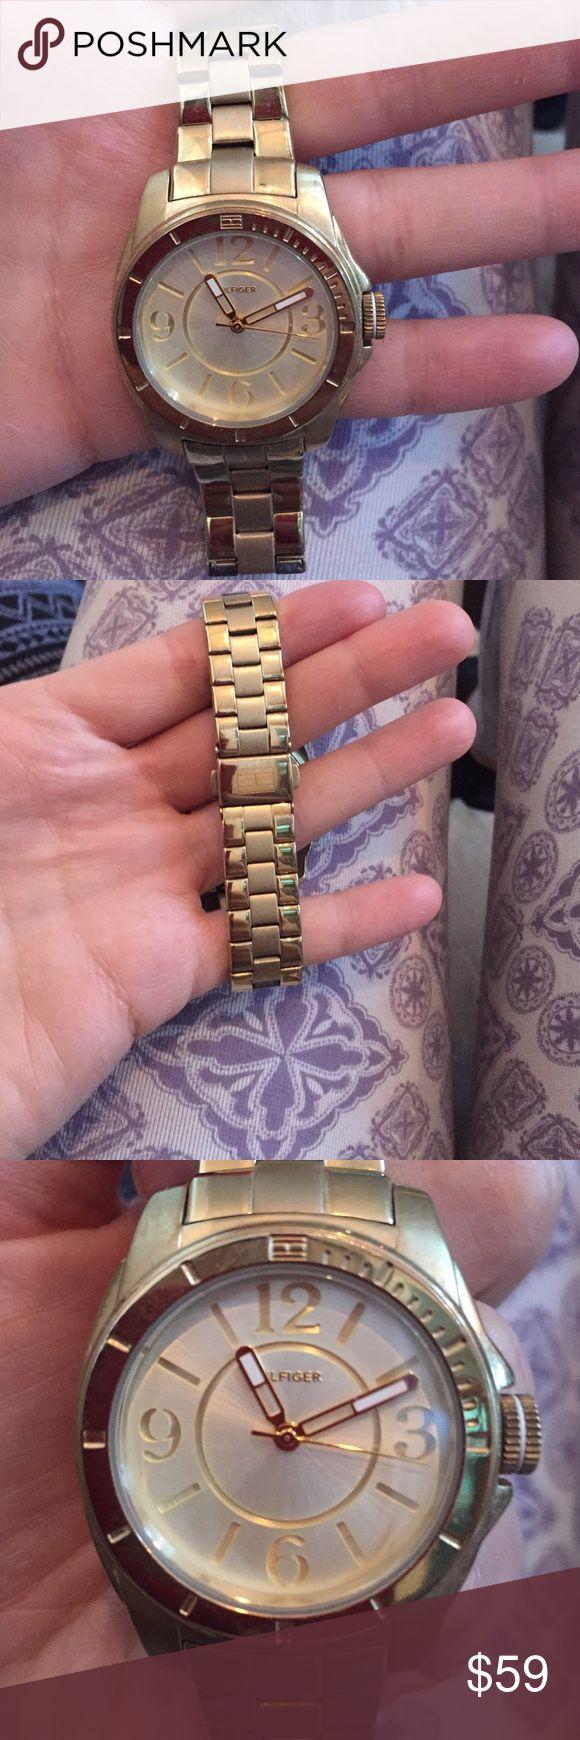 Tommy Hilfiger Watch Work lightly, works, gold Tommy Hilfiger watch. Tommy Hilfiger Accessories Watches